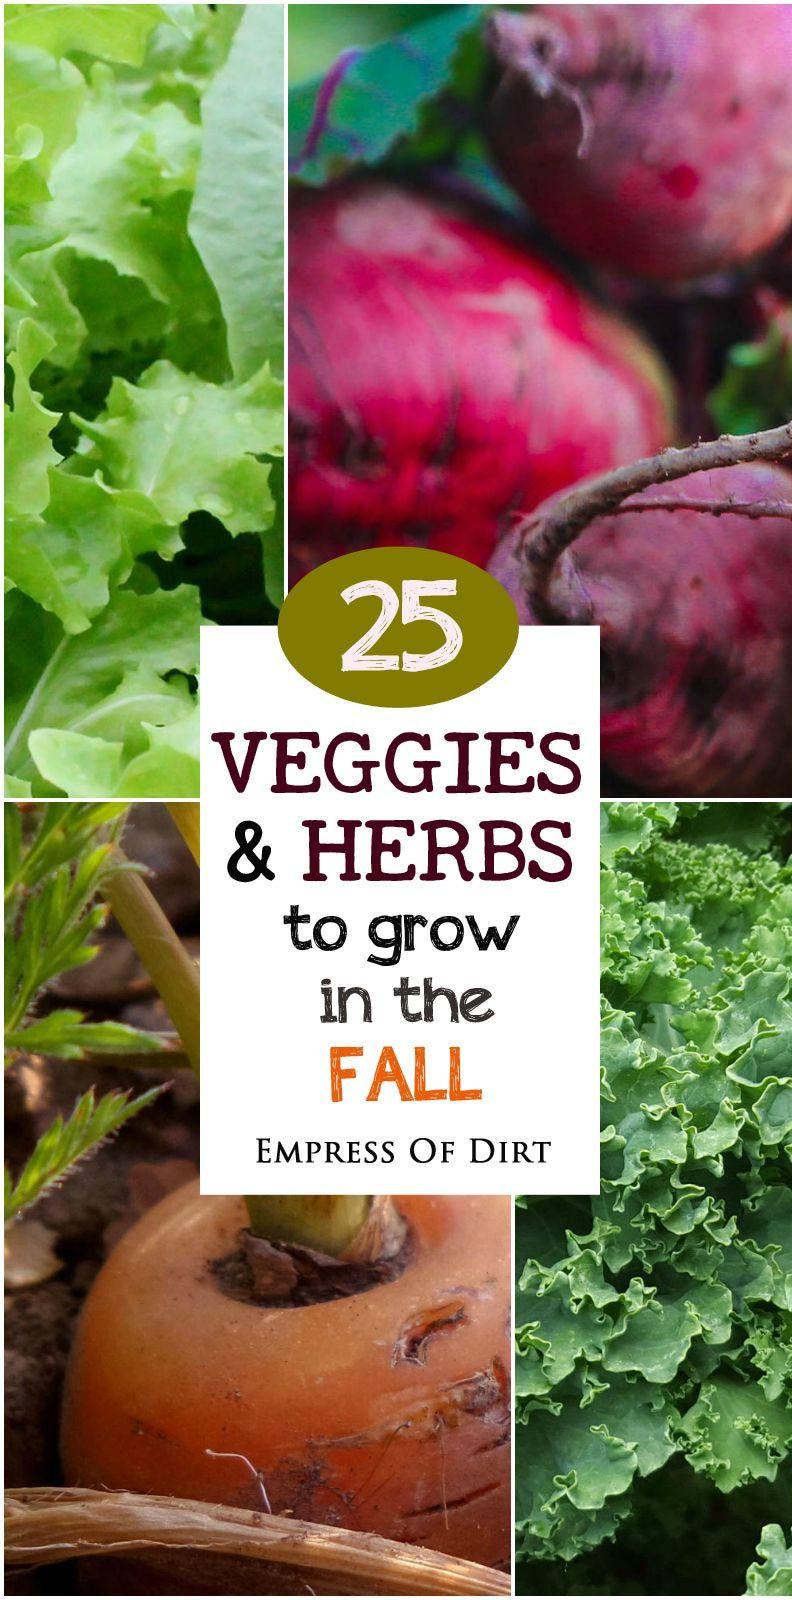 25 veggies u0026 herbs to grow in the fall lettuce kale and broccoli